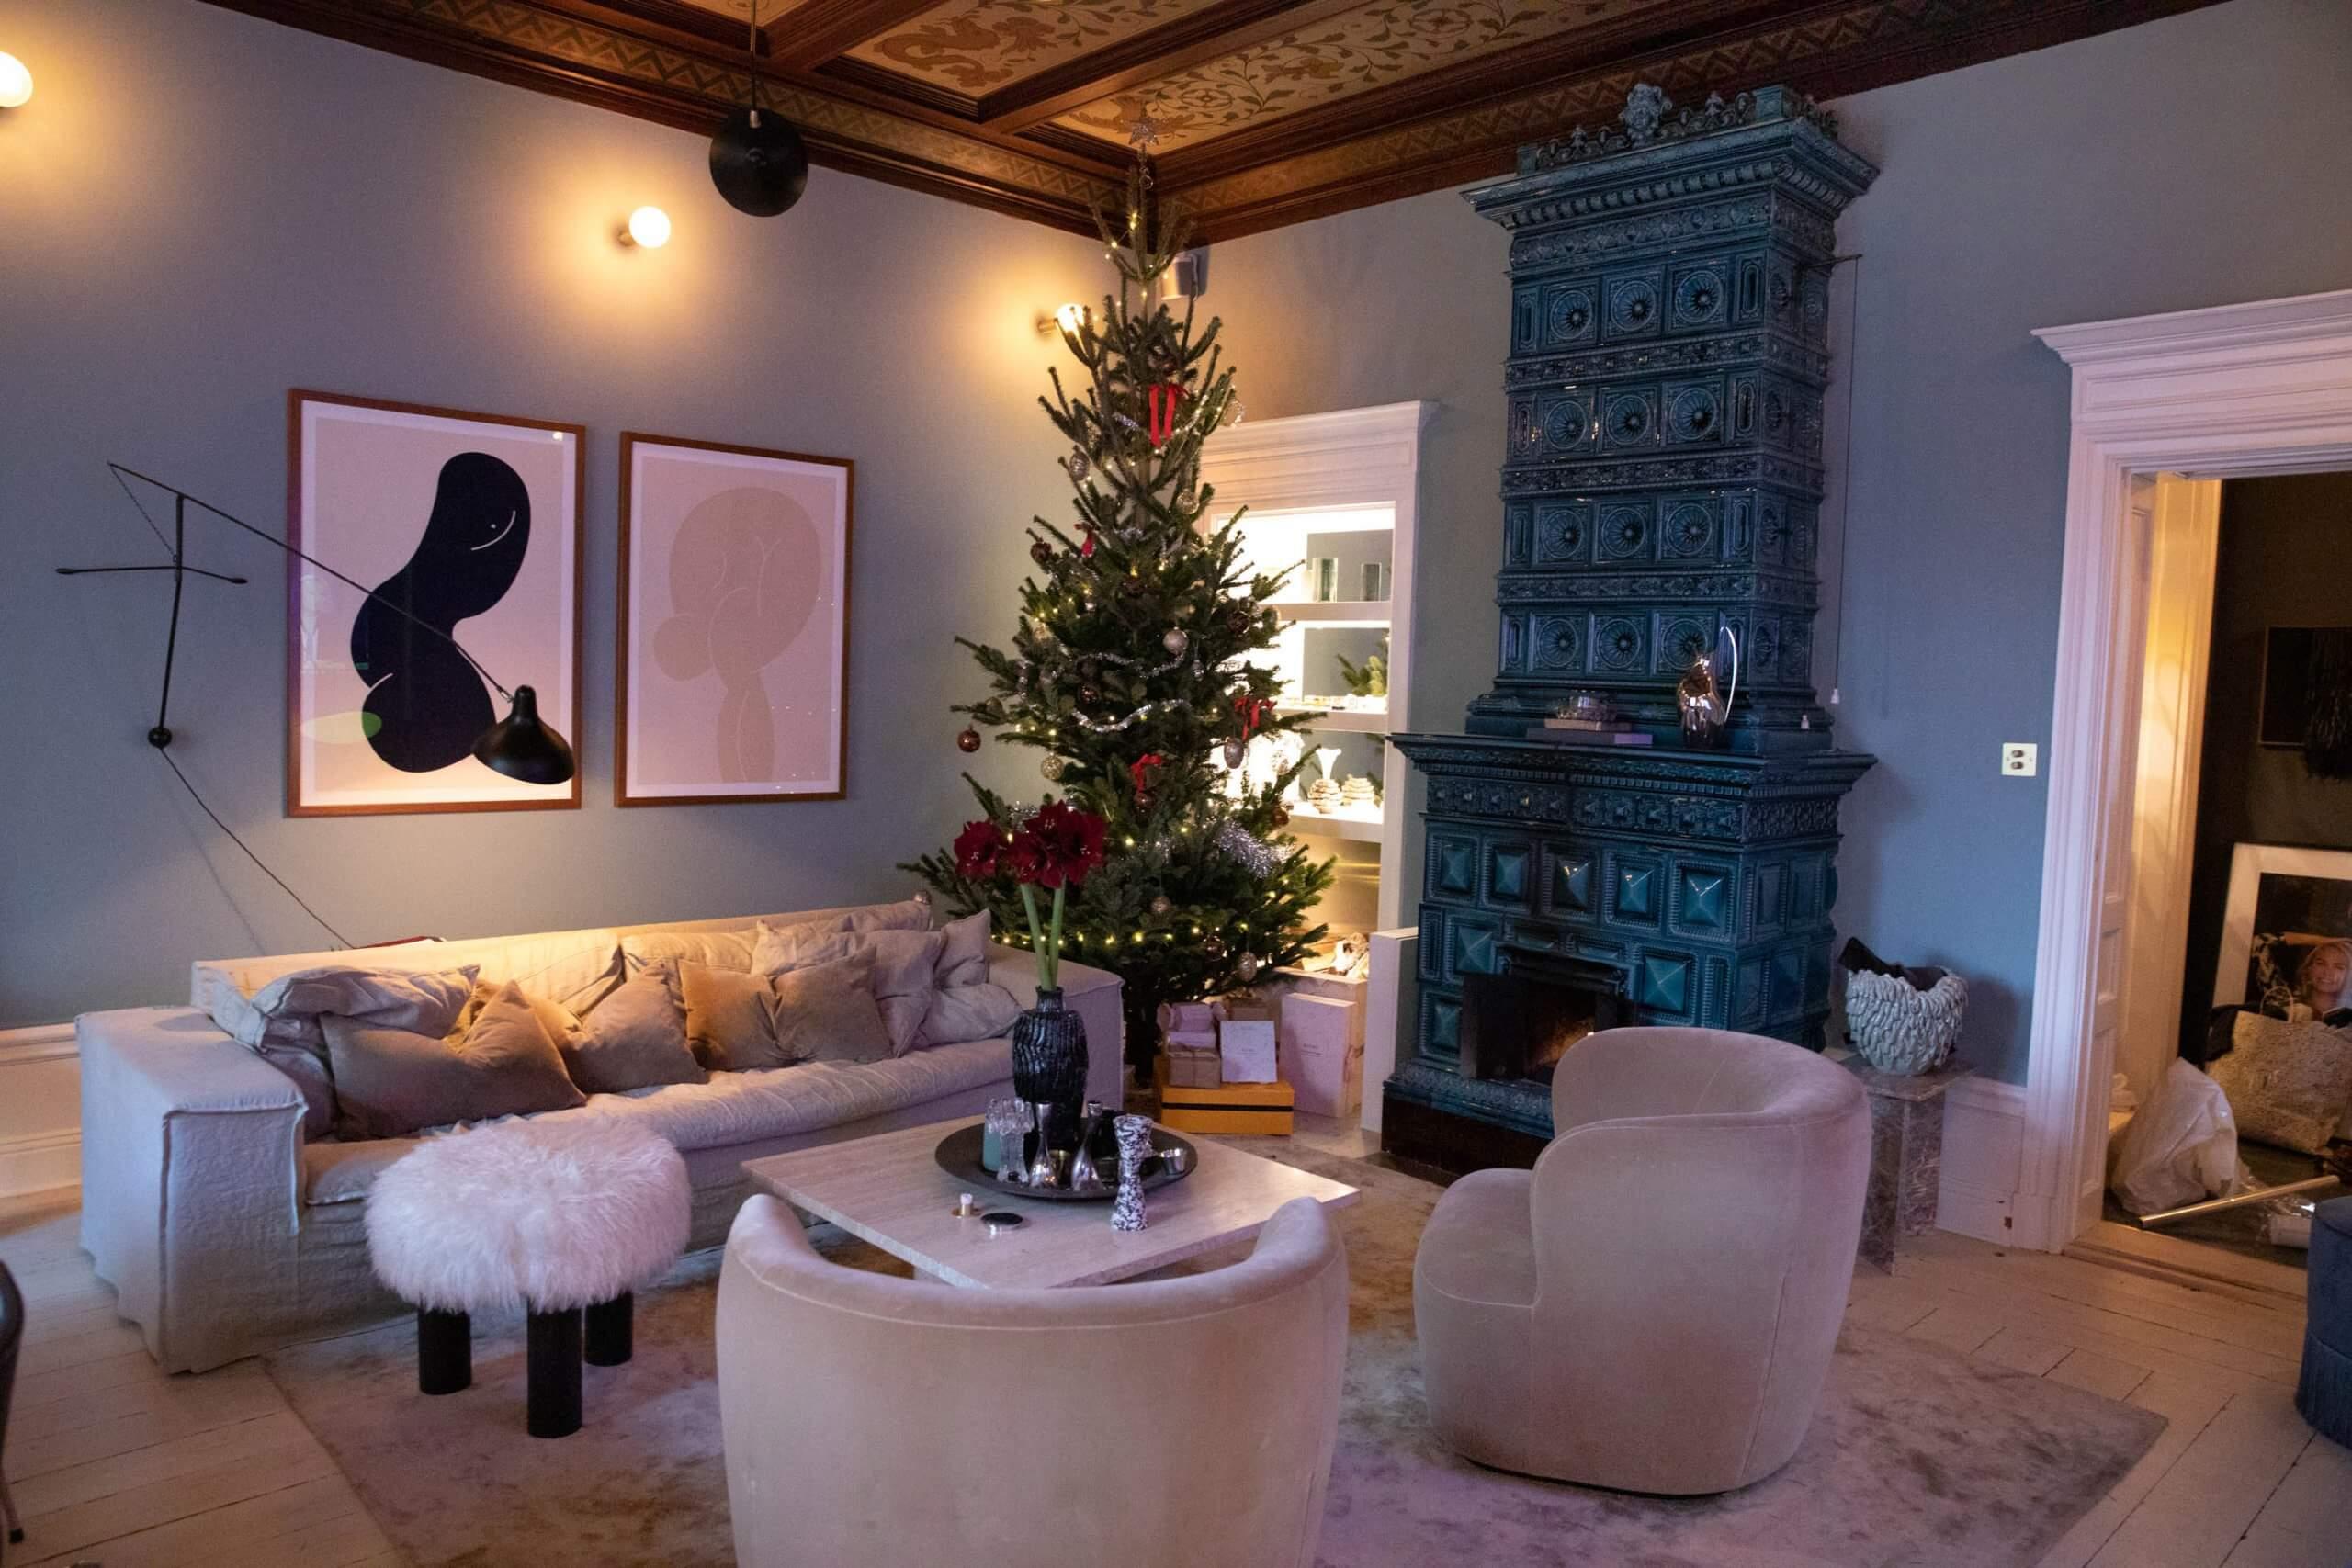 Petra Tungarden lagenhet julgran